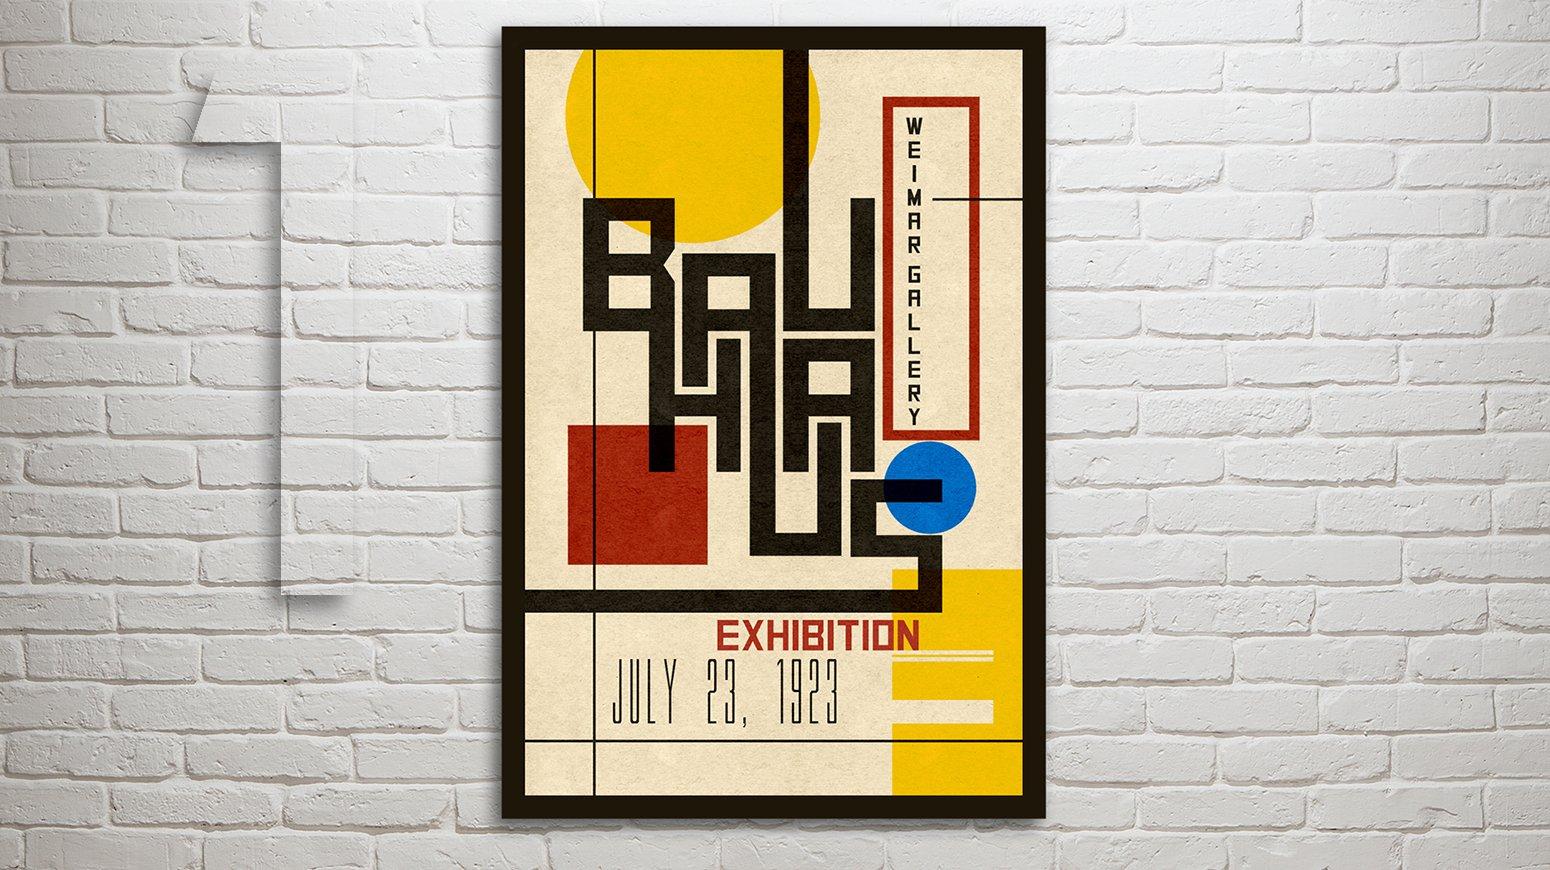 Photoshop: How to Design Create a Vintage, Bauhaus Poster | Marty Geller